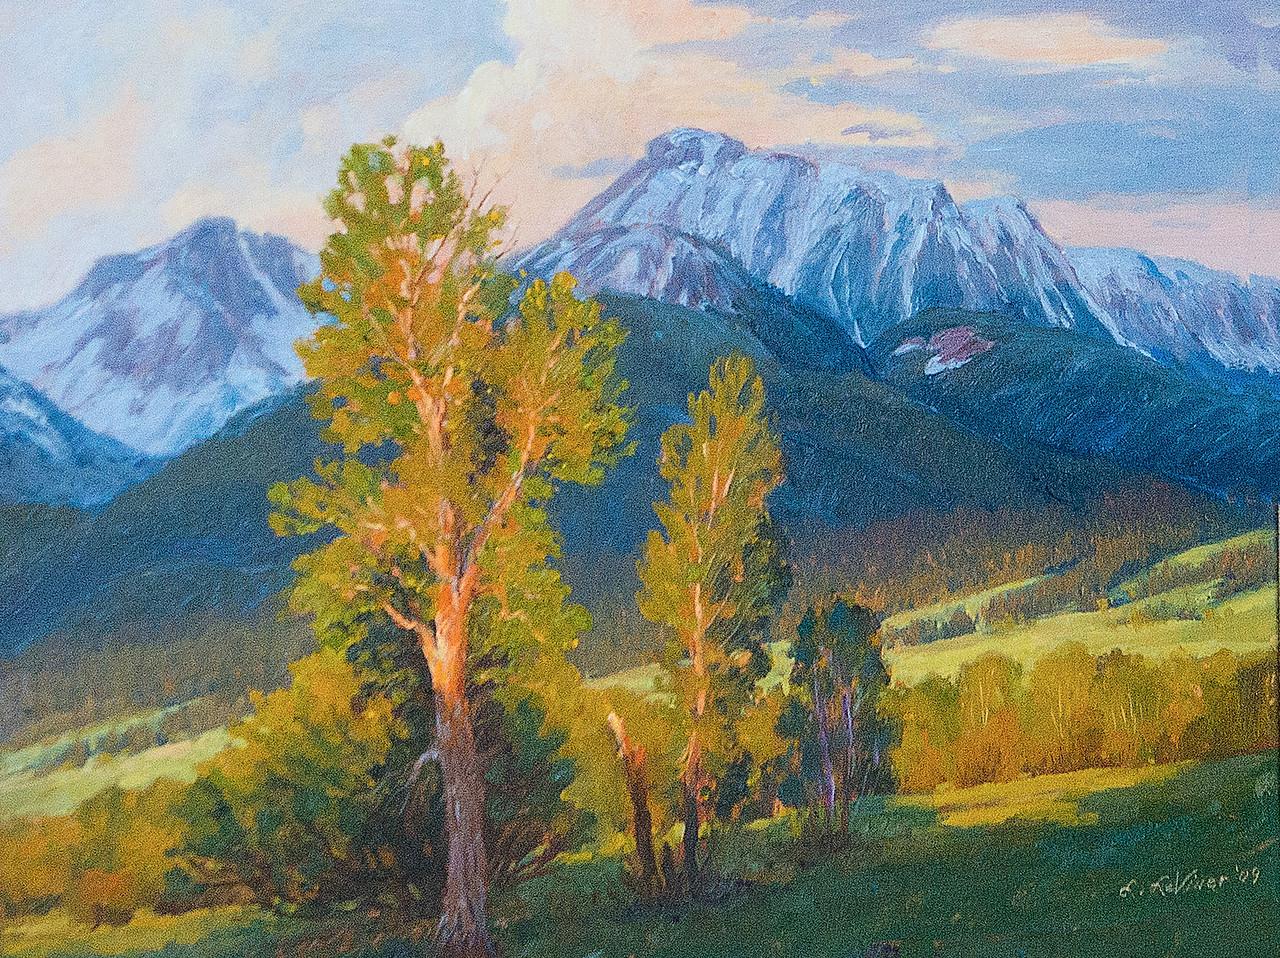 Leslie Leviner's En Plein Air oil painting captures fleeting morning light on Ruby Peak.